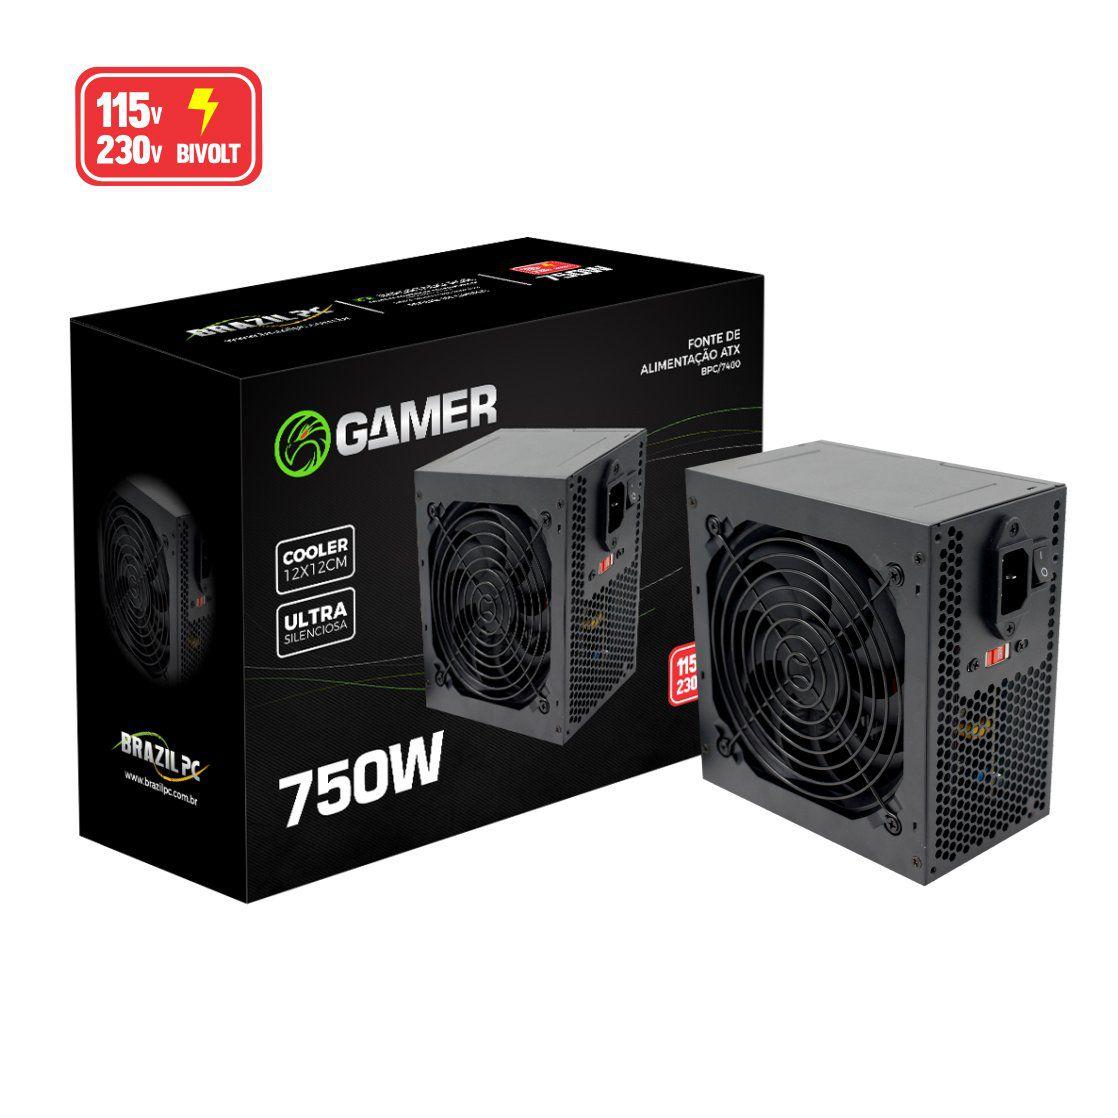 Fonte Gamer ATX 750W Real BPC/7400-B BOX